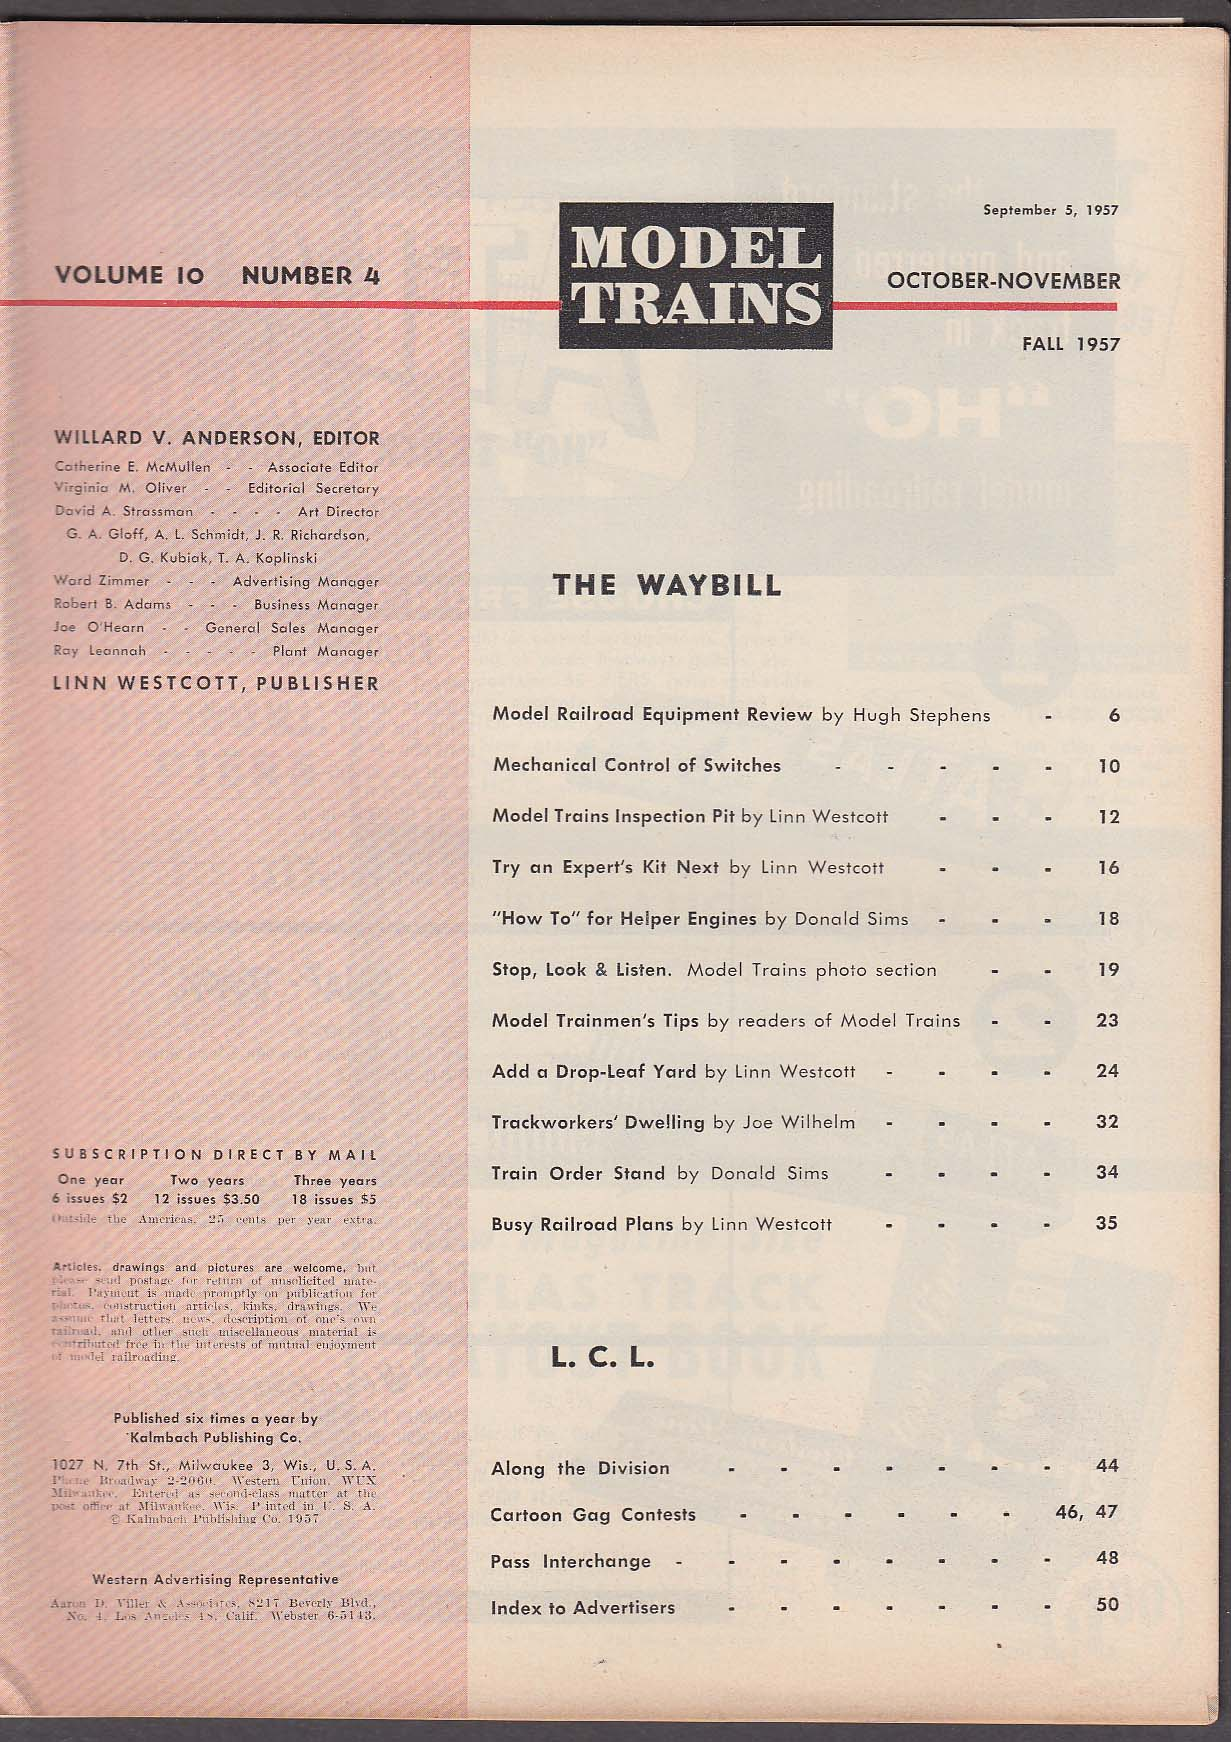 MODEL TRAINS Car Kit Reviews; Drop-Leaf Table; Mechanical Control ++ Fall 1957